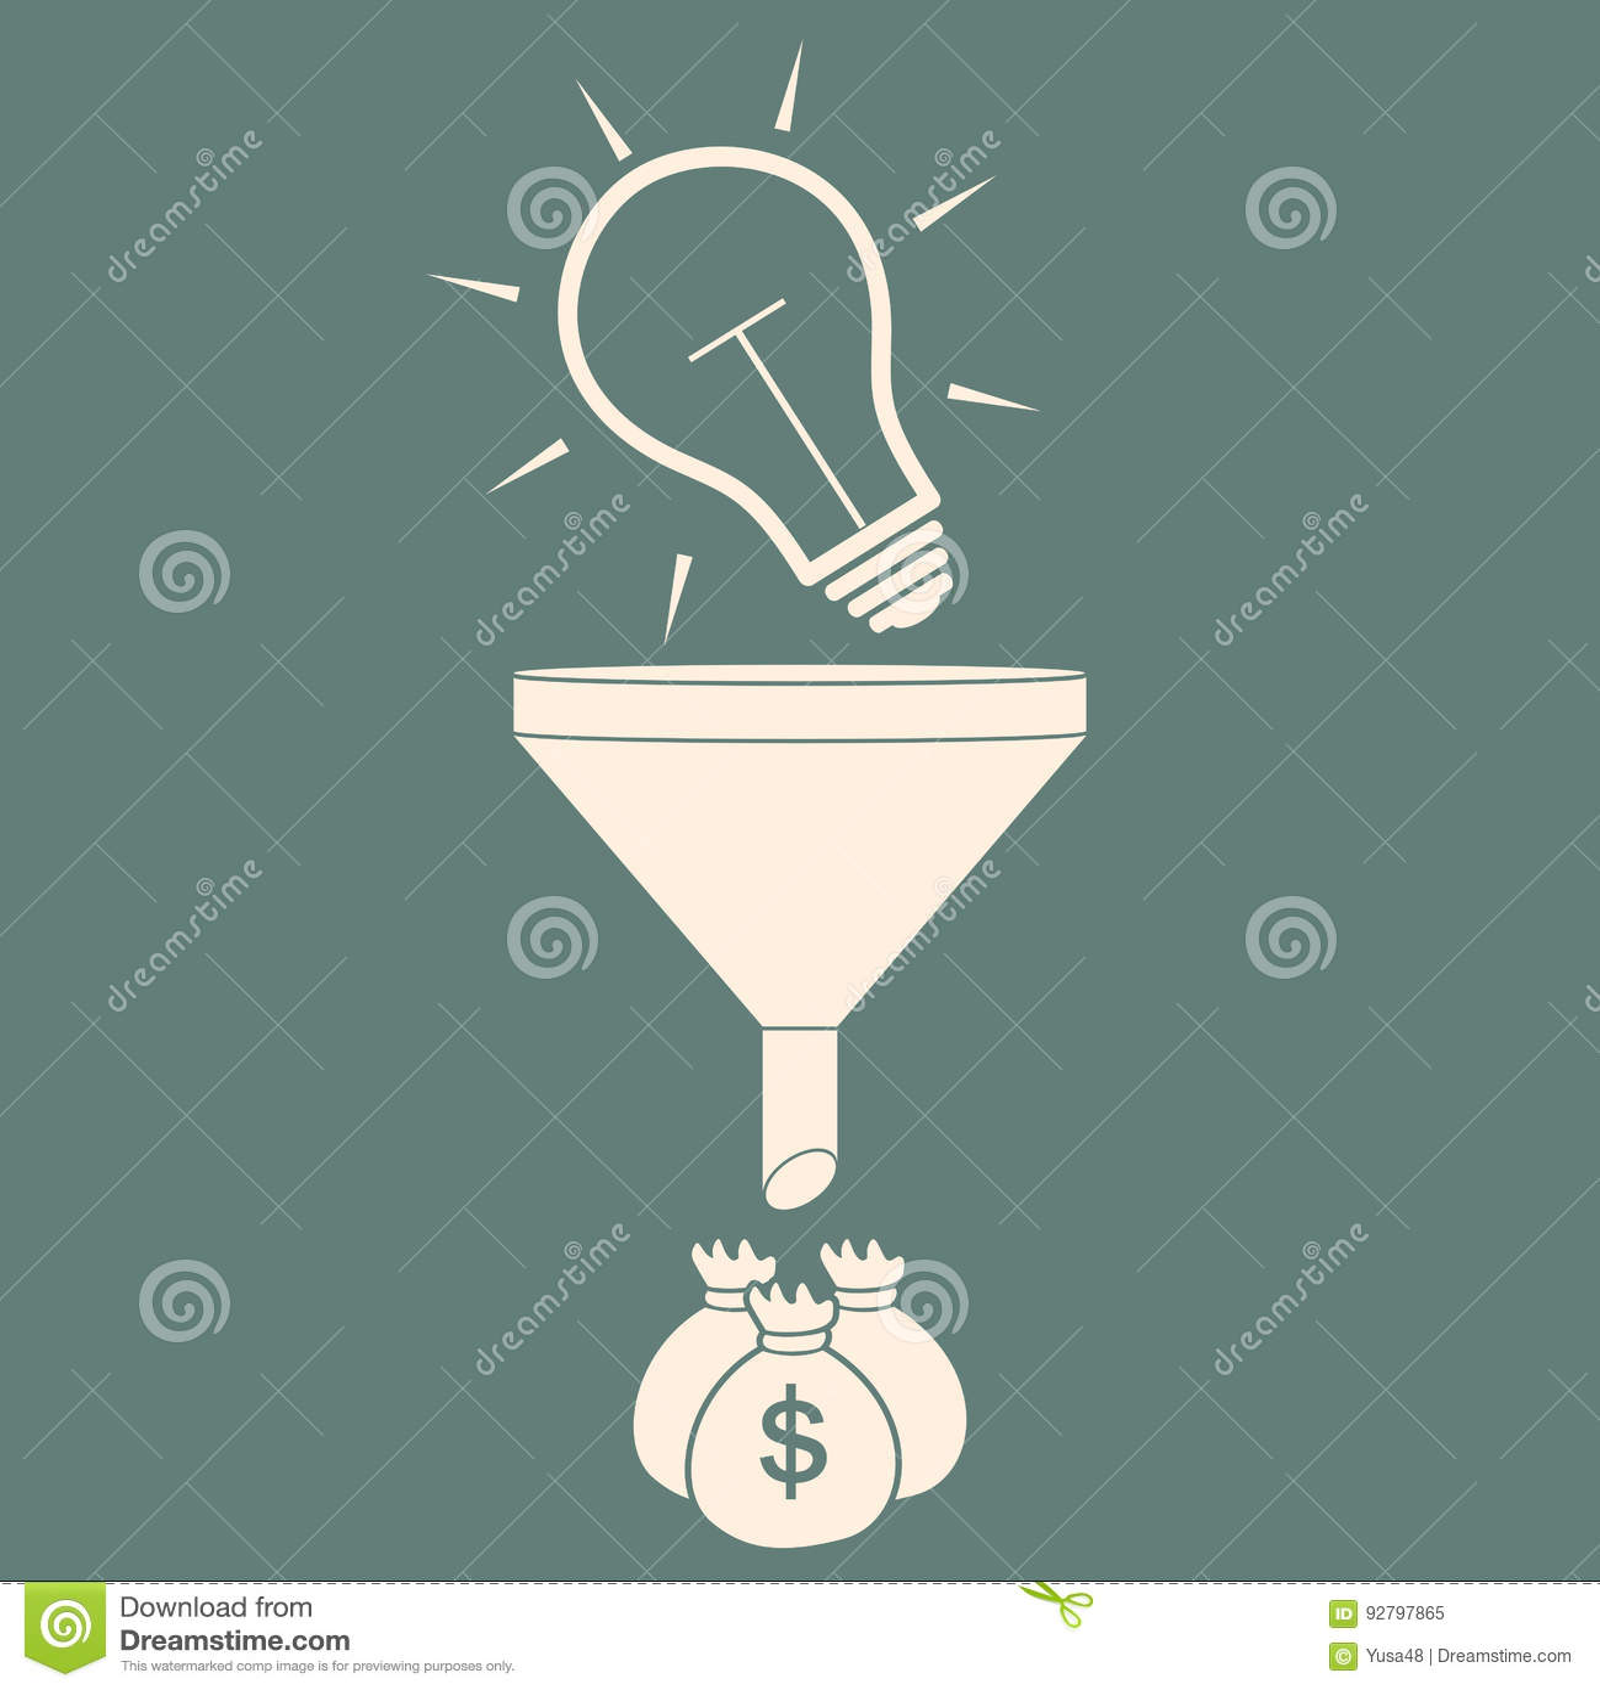 Convert The Idea Into Money  Concept Profit  Stock Vector